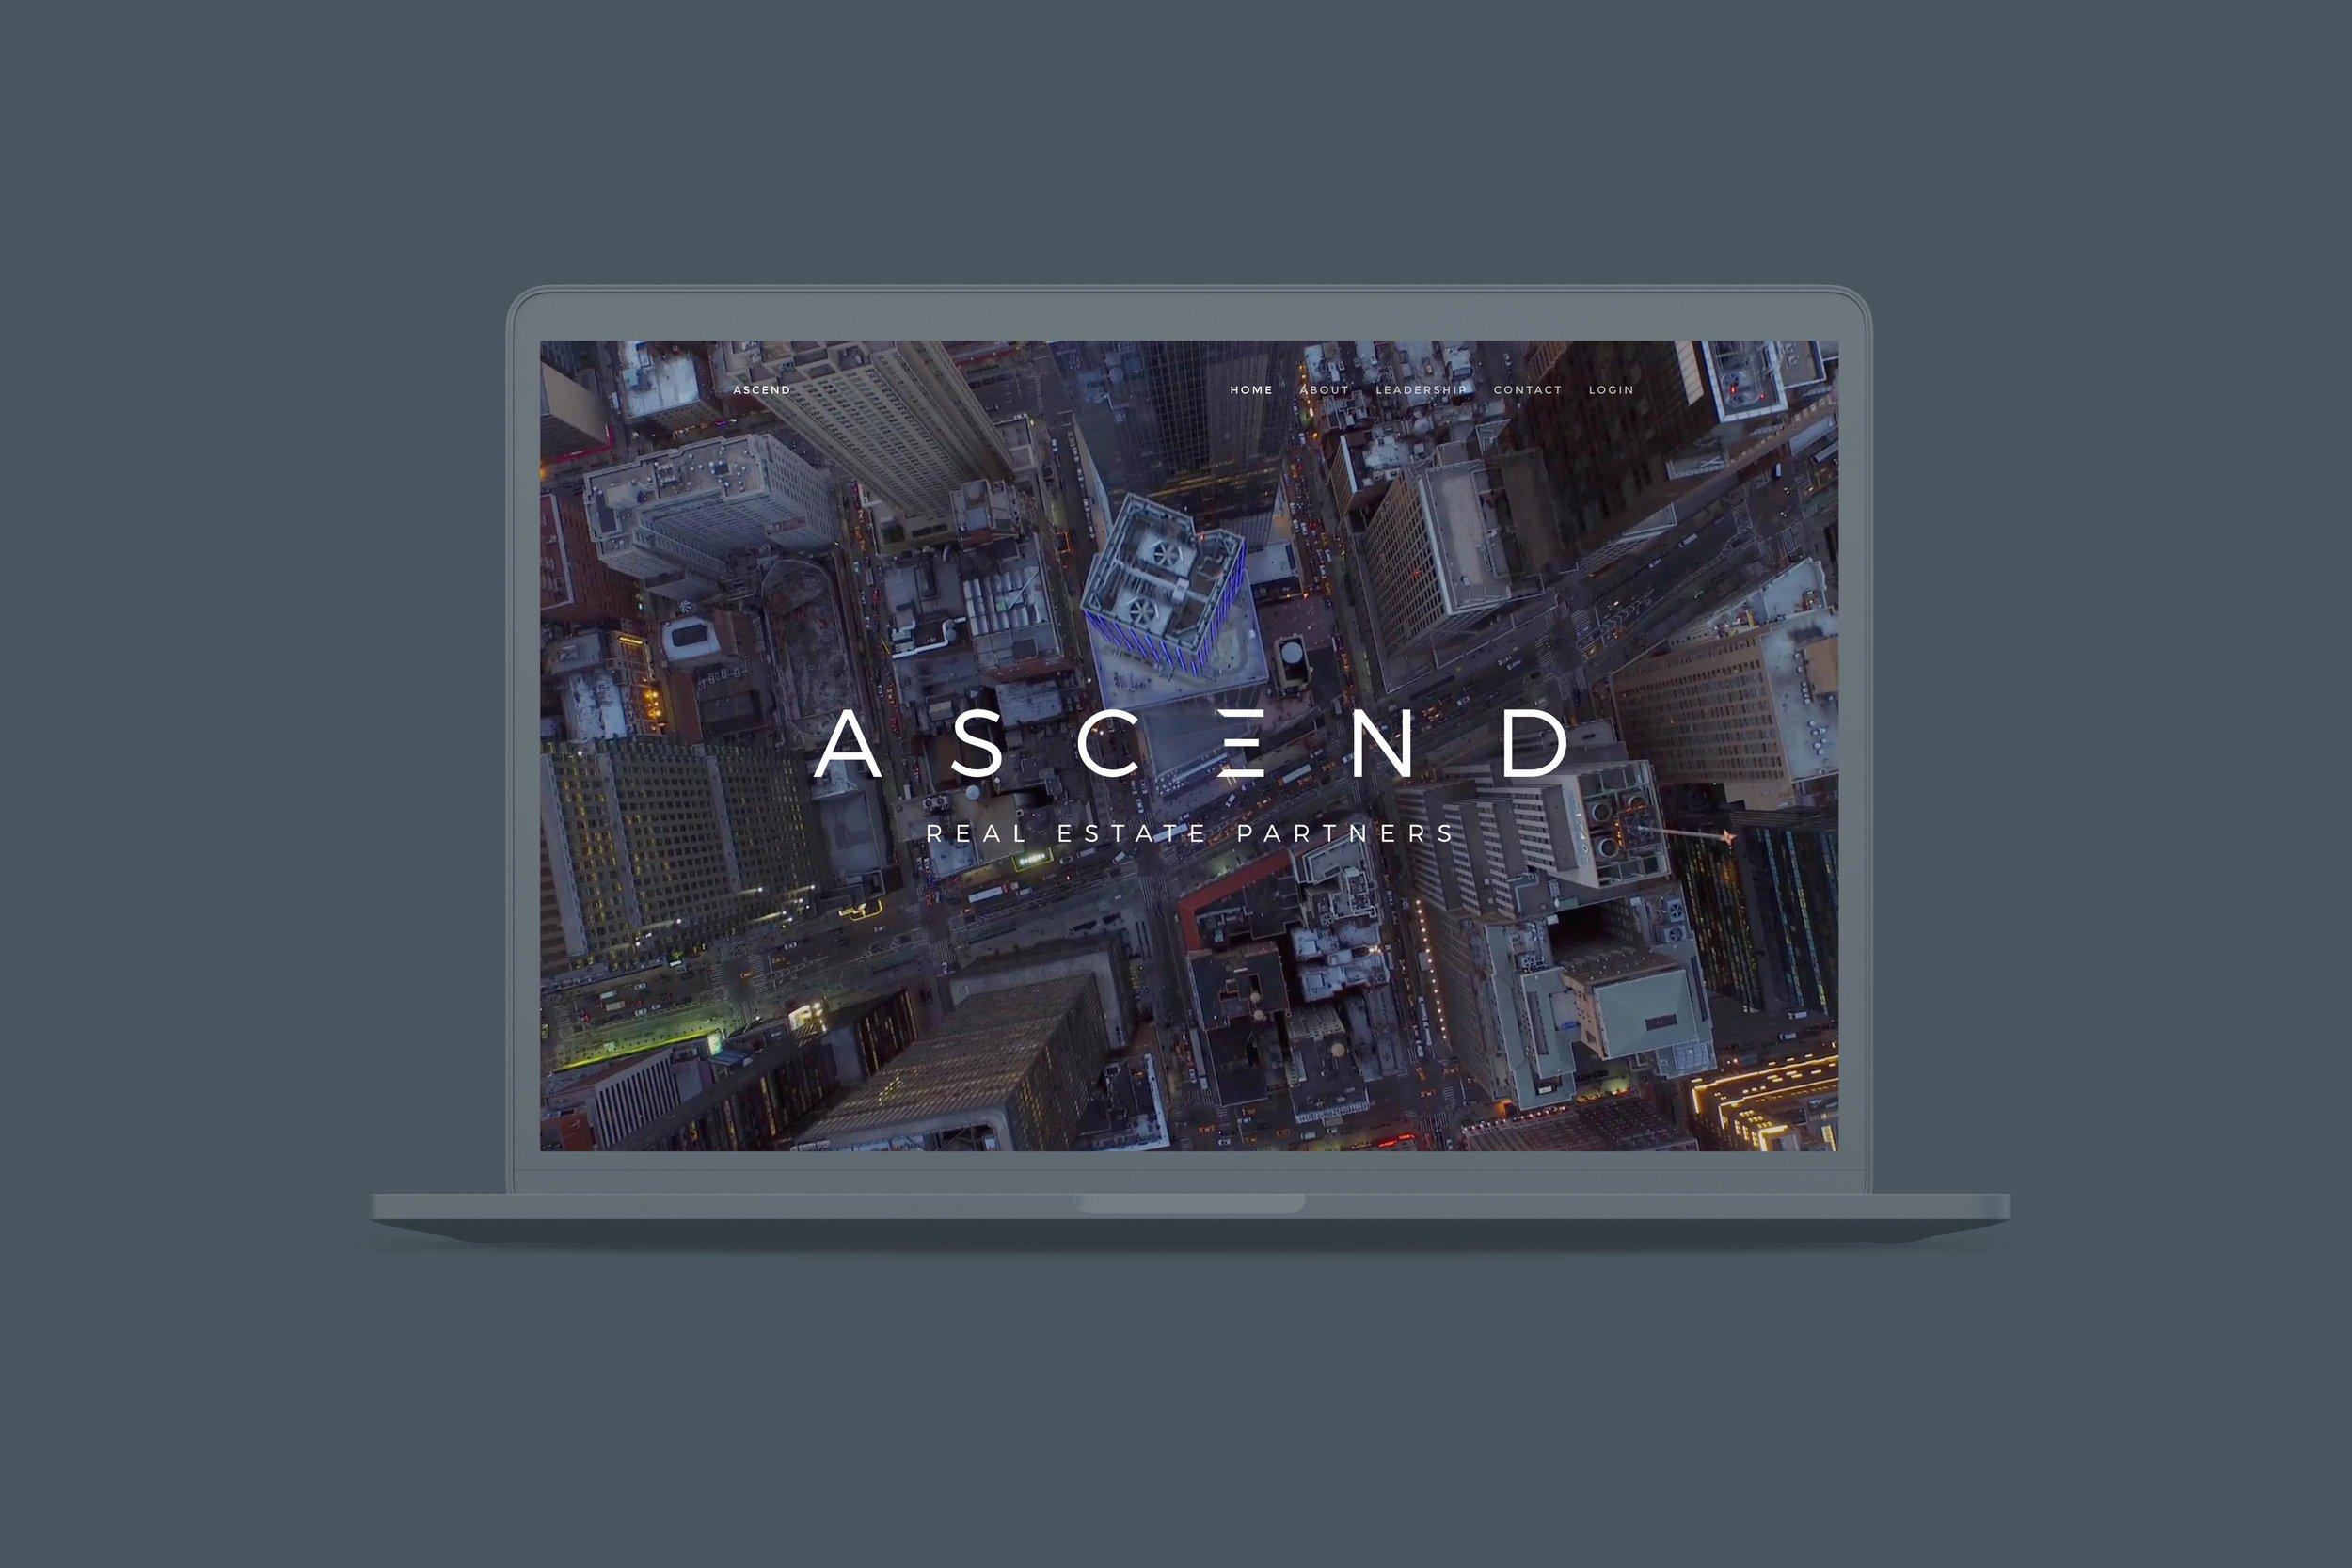 ascend(1).jpg